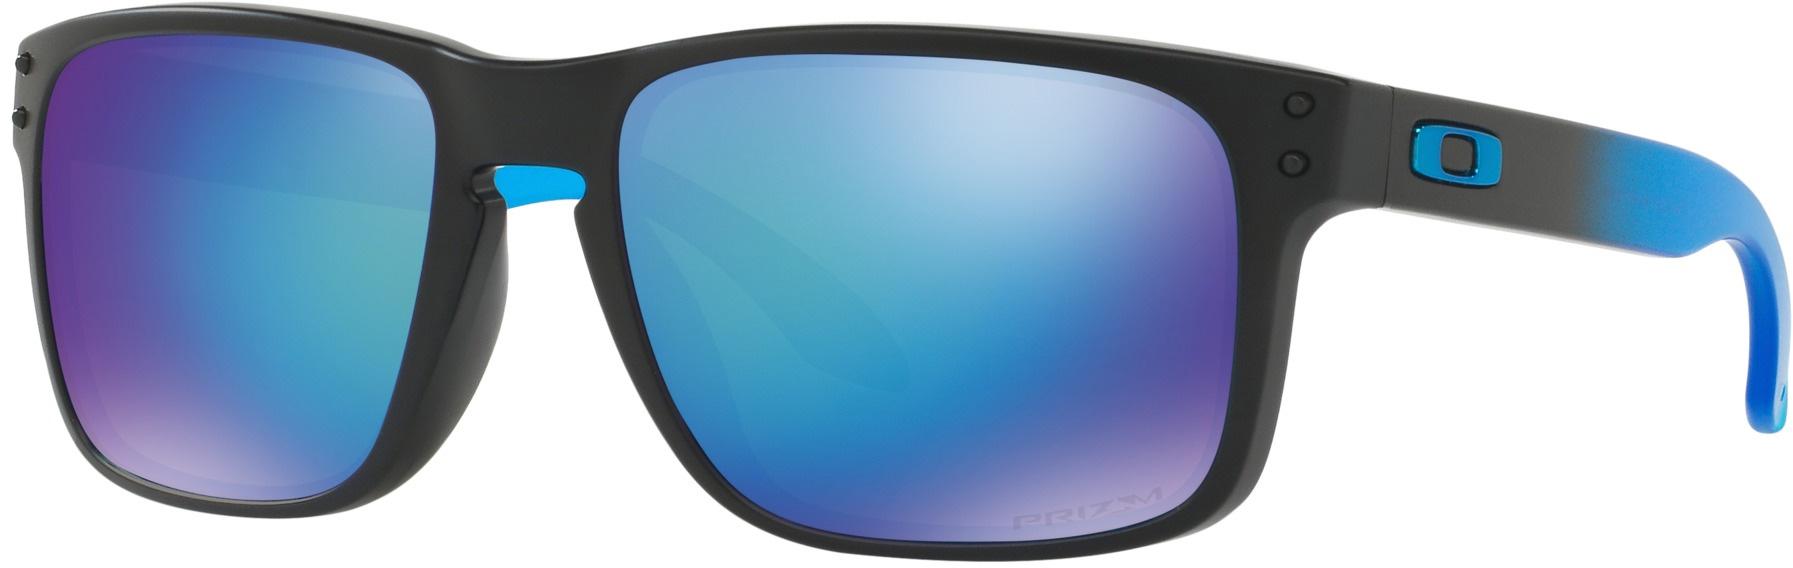 f883ec3819 Oakley Holbrook Prizm Polarized Sapphire Fade